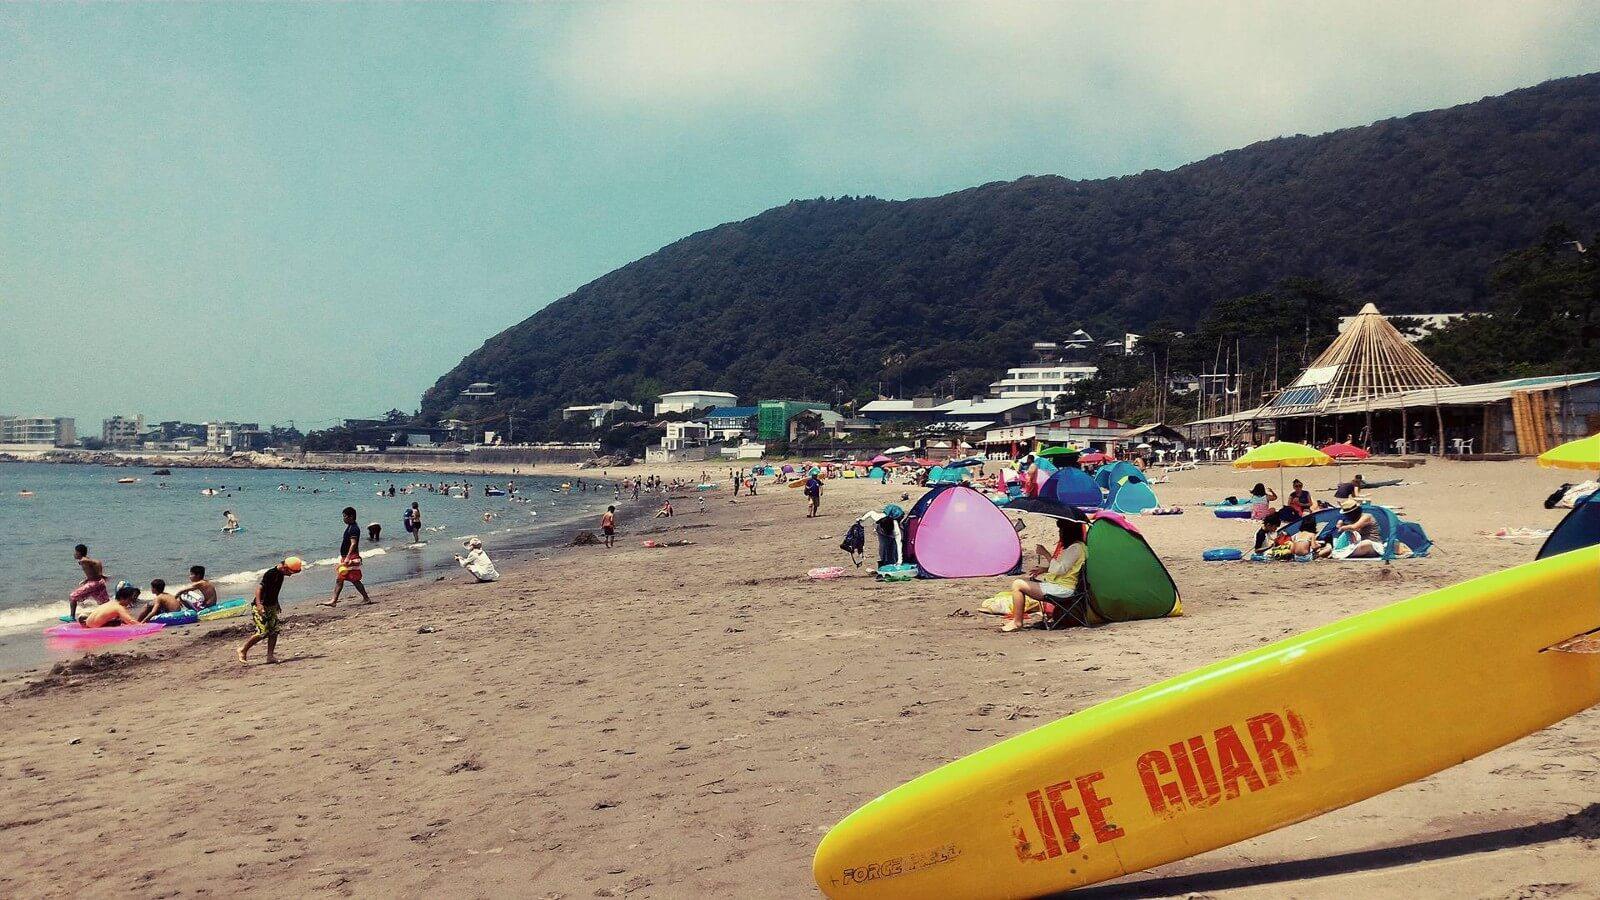 Beach in Japan